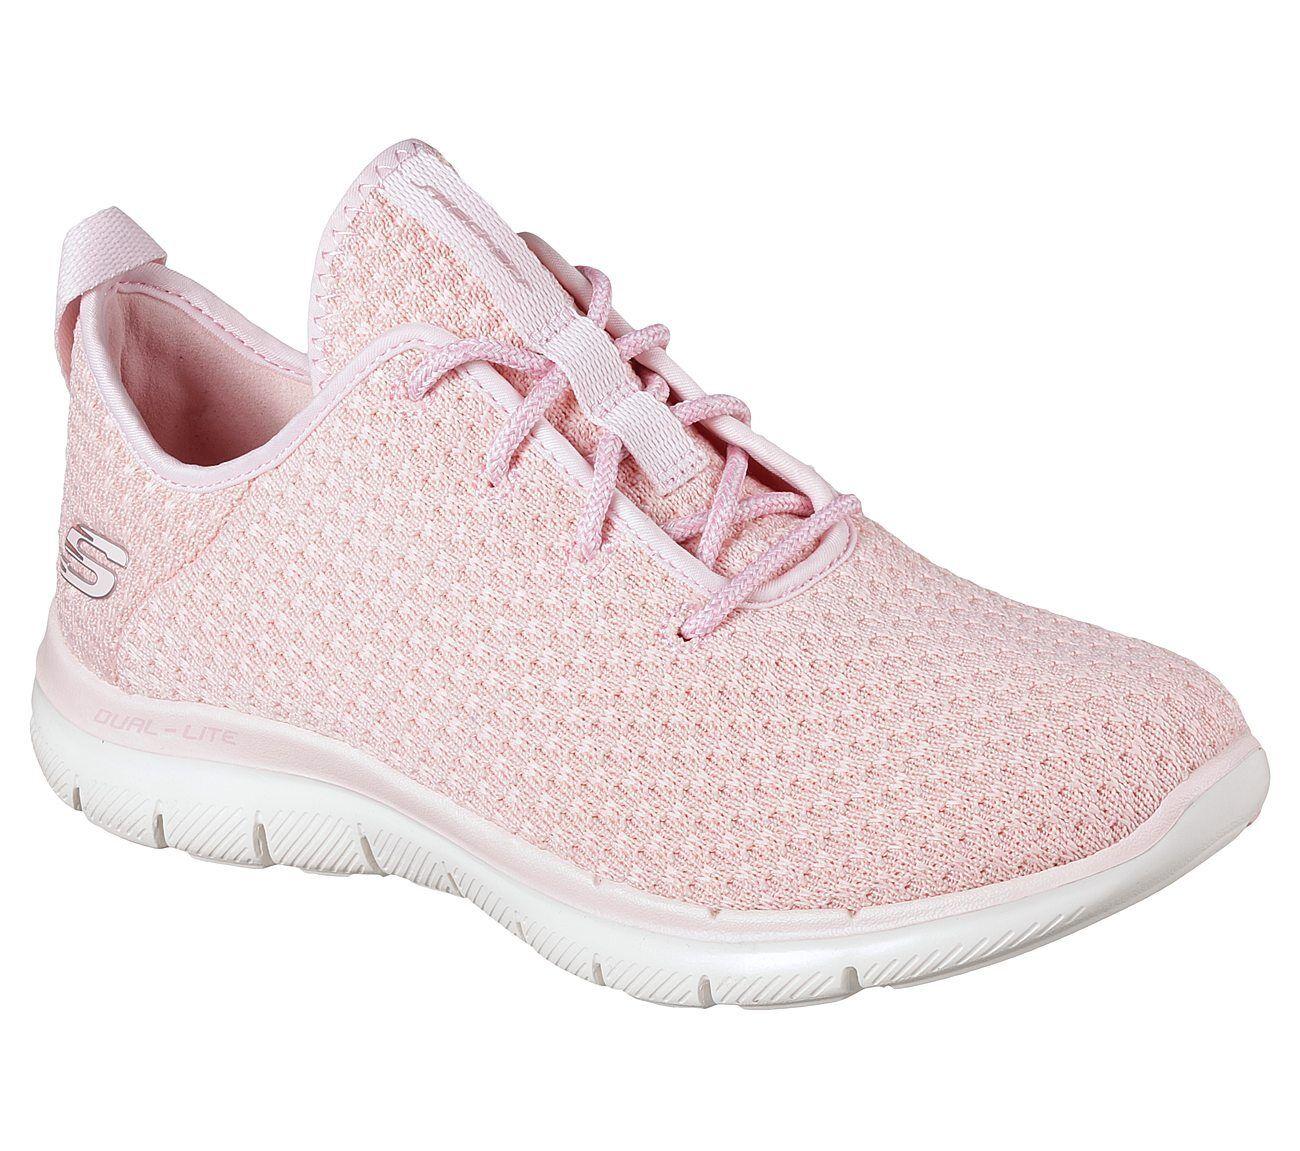 Details zu NEU SKECHERS Damen Sneakers FLEX APPEAL 2.0 BOLD MOVE Pink